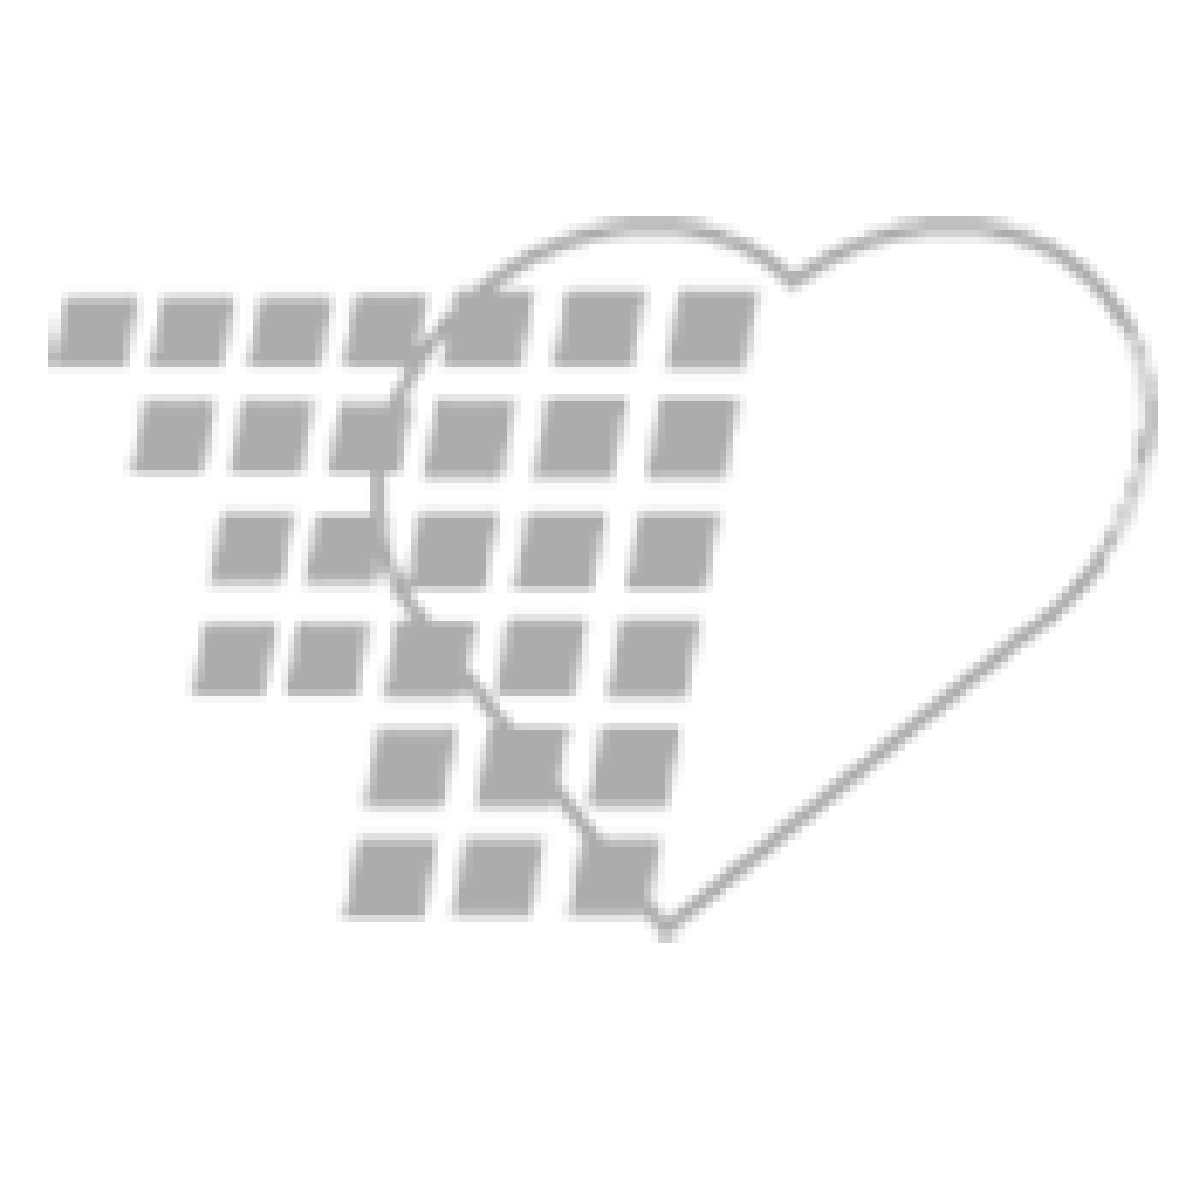 02-24-6005 Welch Allyn Braun Pro 6000 Probe Covers